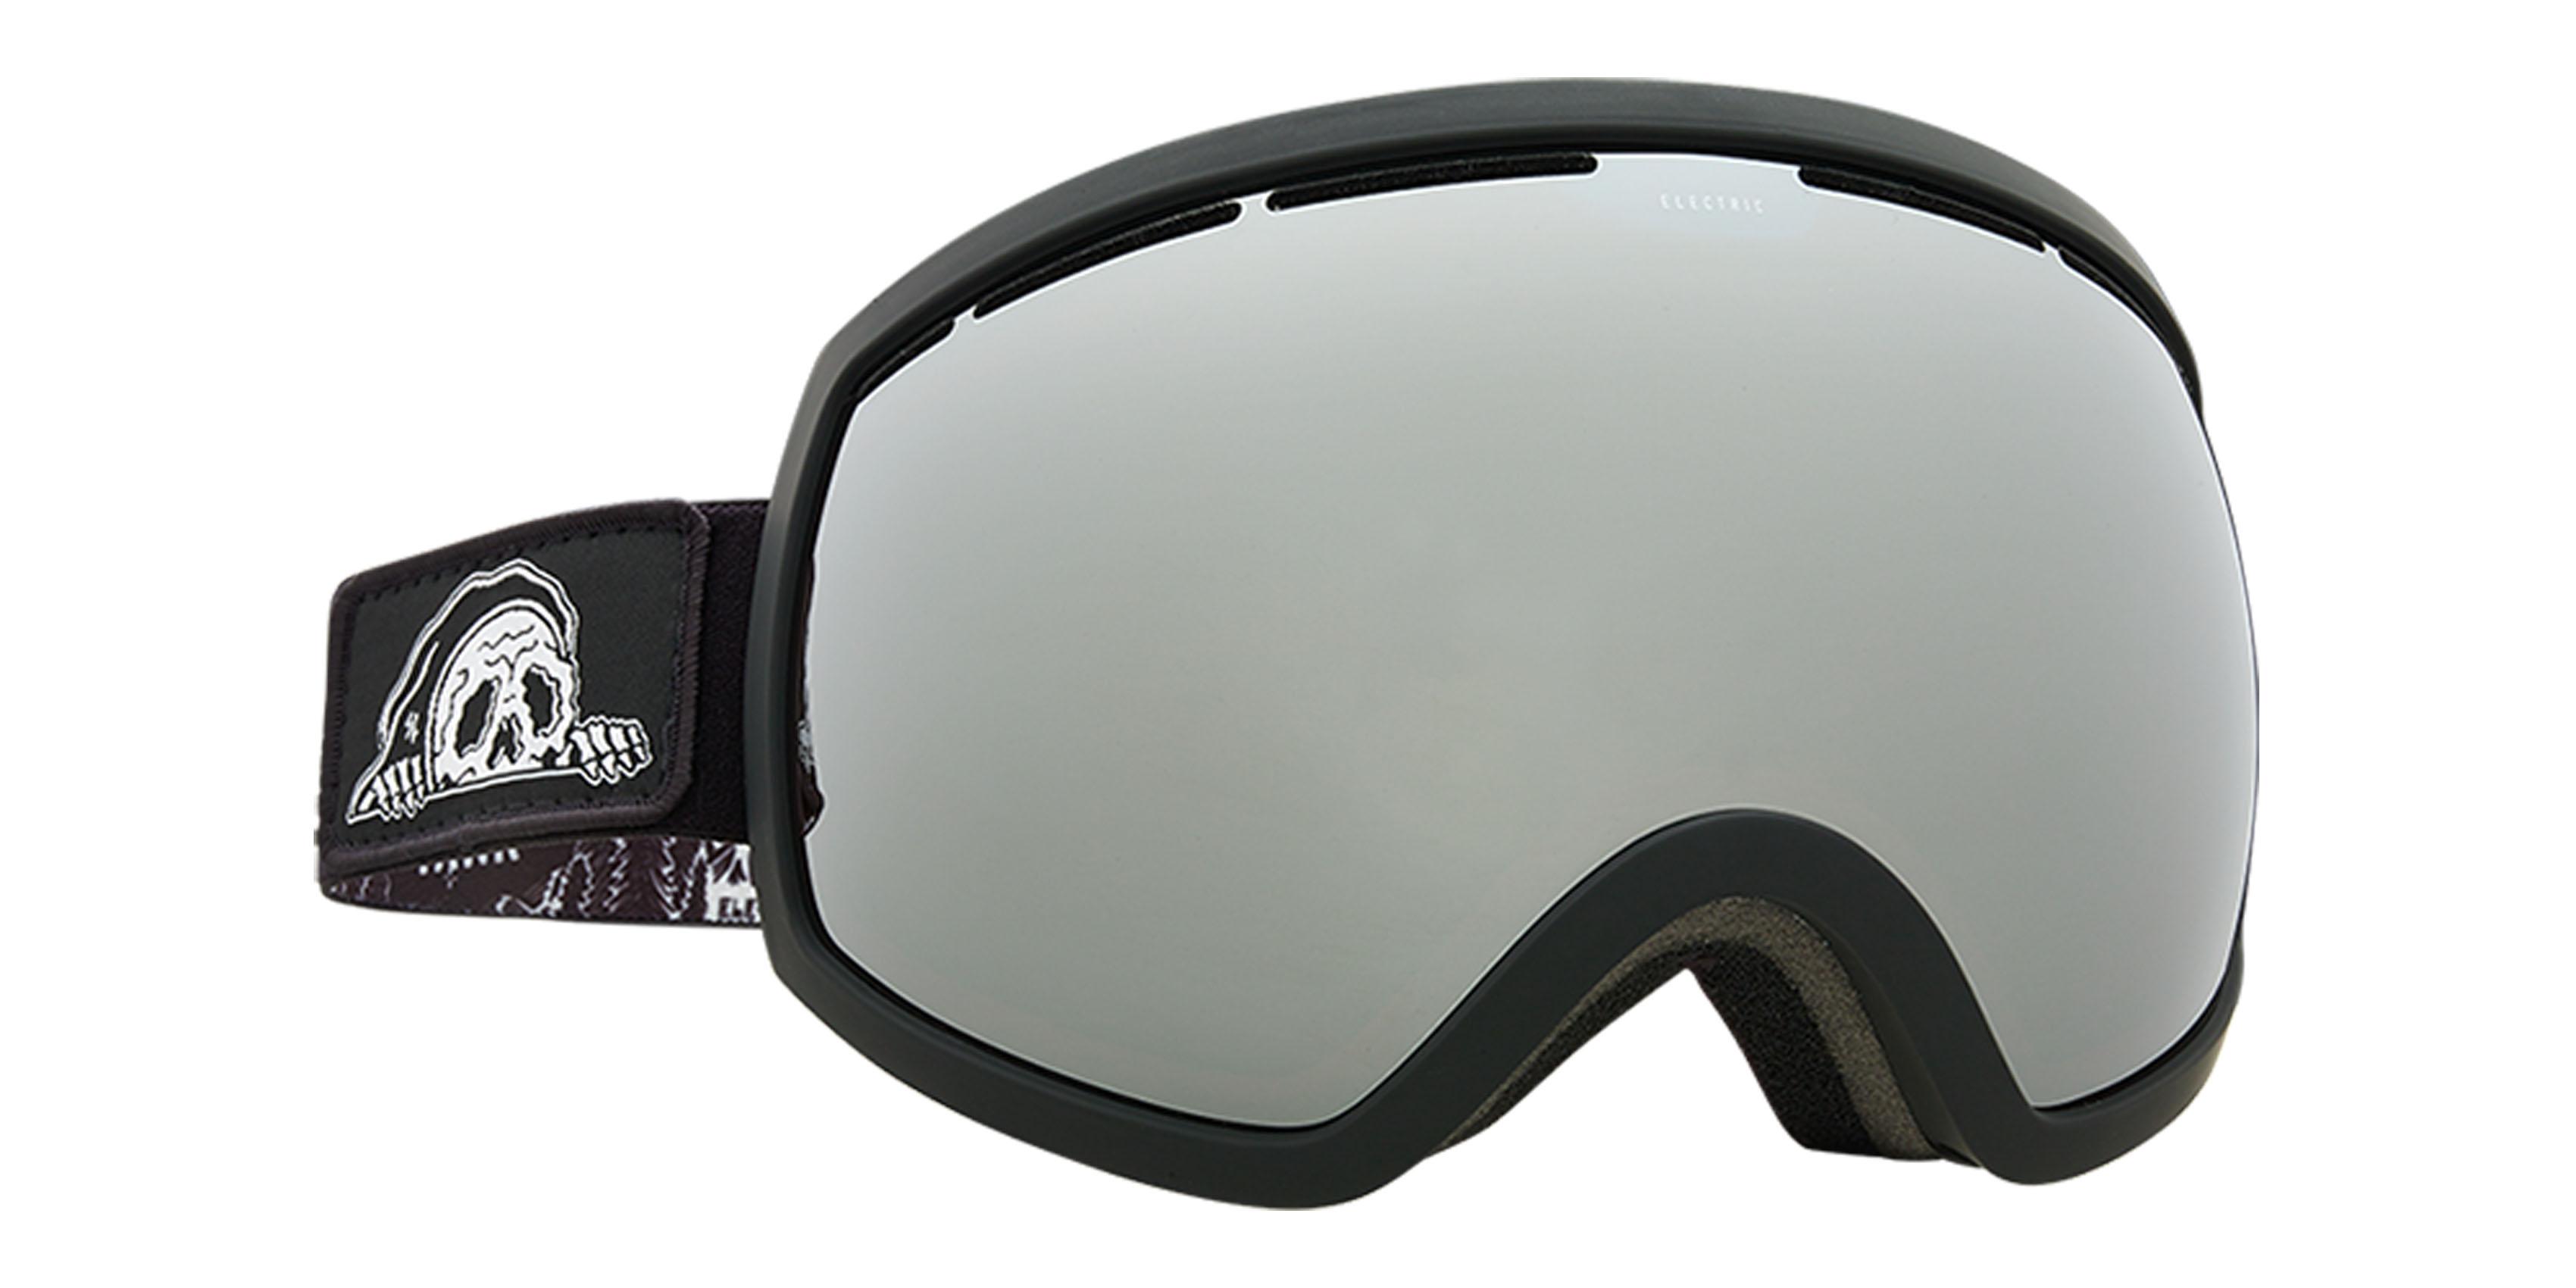 9ef37ef24a4 Electric EG2 Snowboard Goggles 2018 - Sketchy Tank w Brose Silver Chrome +  Bonus Choice Lens. 34%